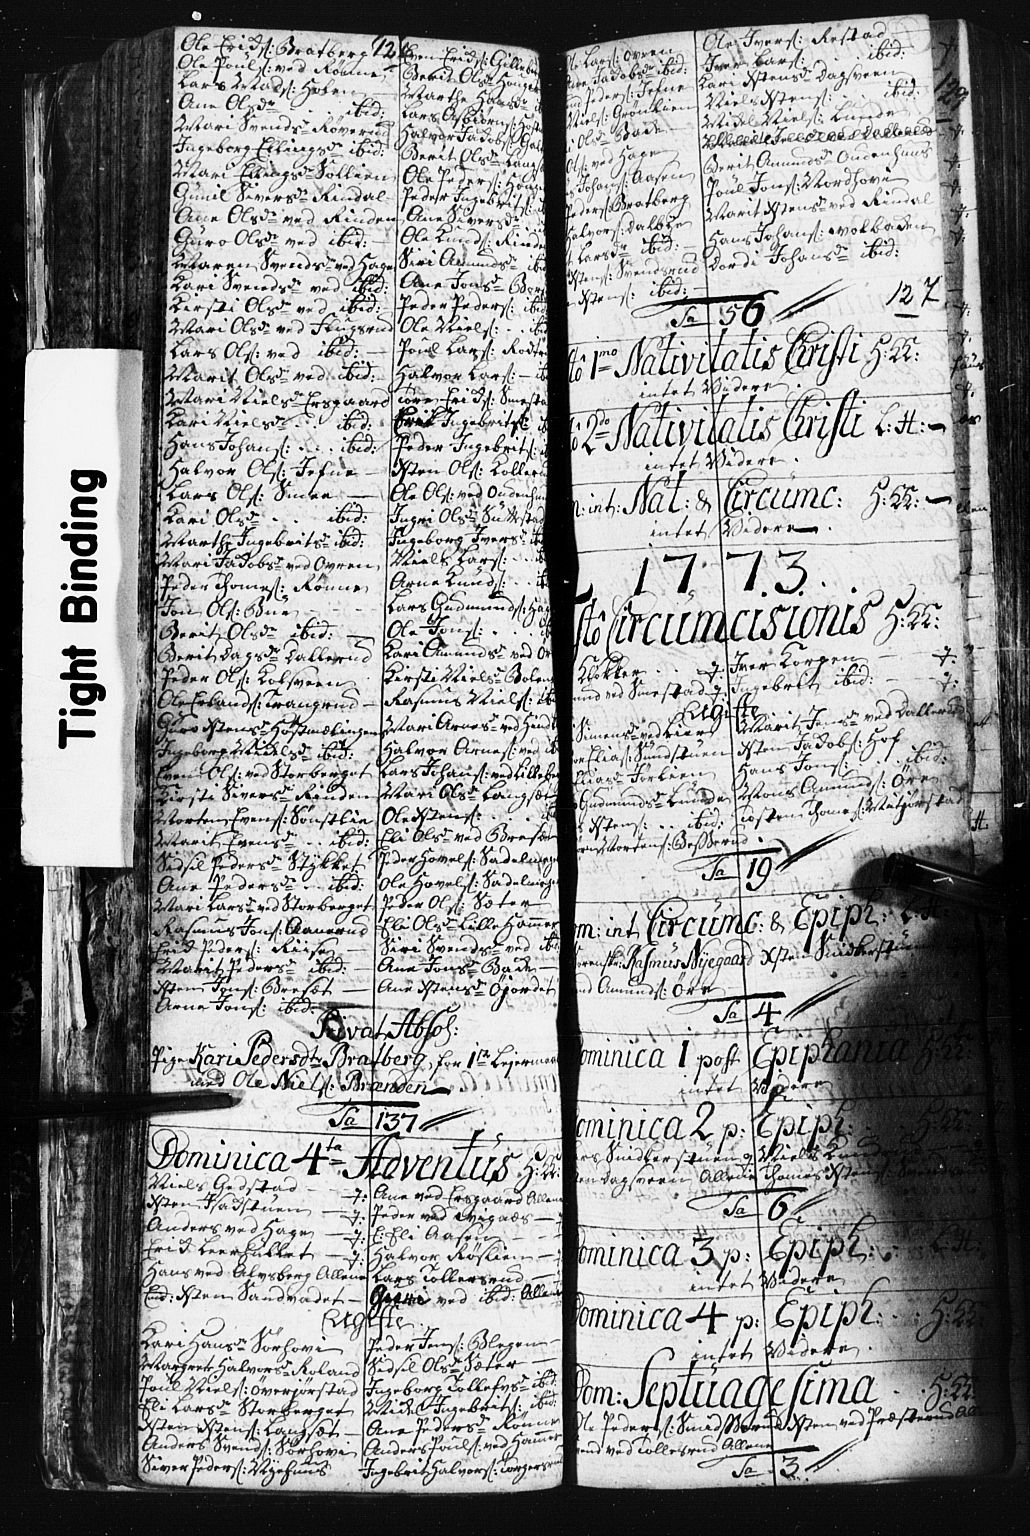 SAH, Fåberg prestekontor, Klokkerbok nr. 3, 1768-1796, s. 126-127